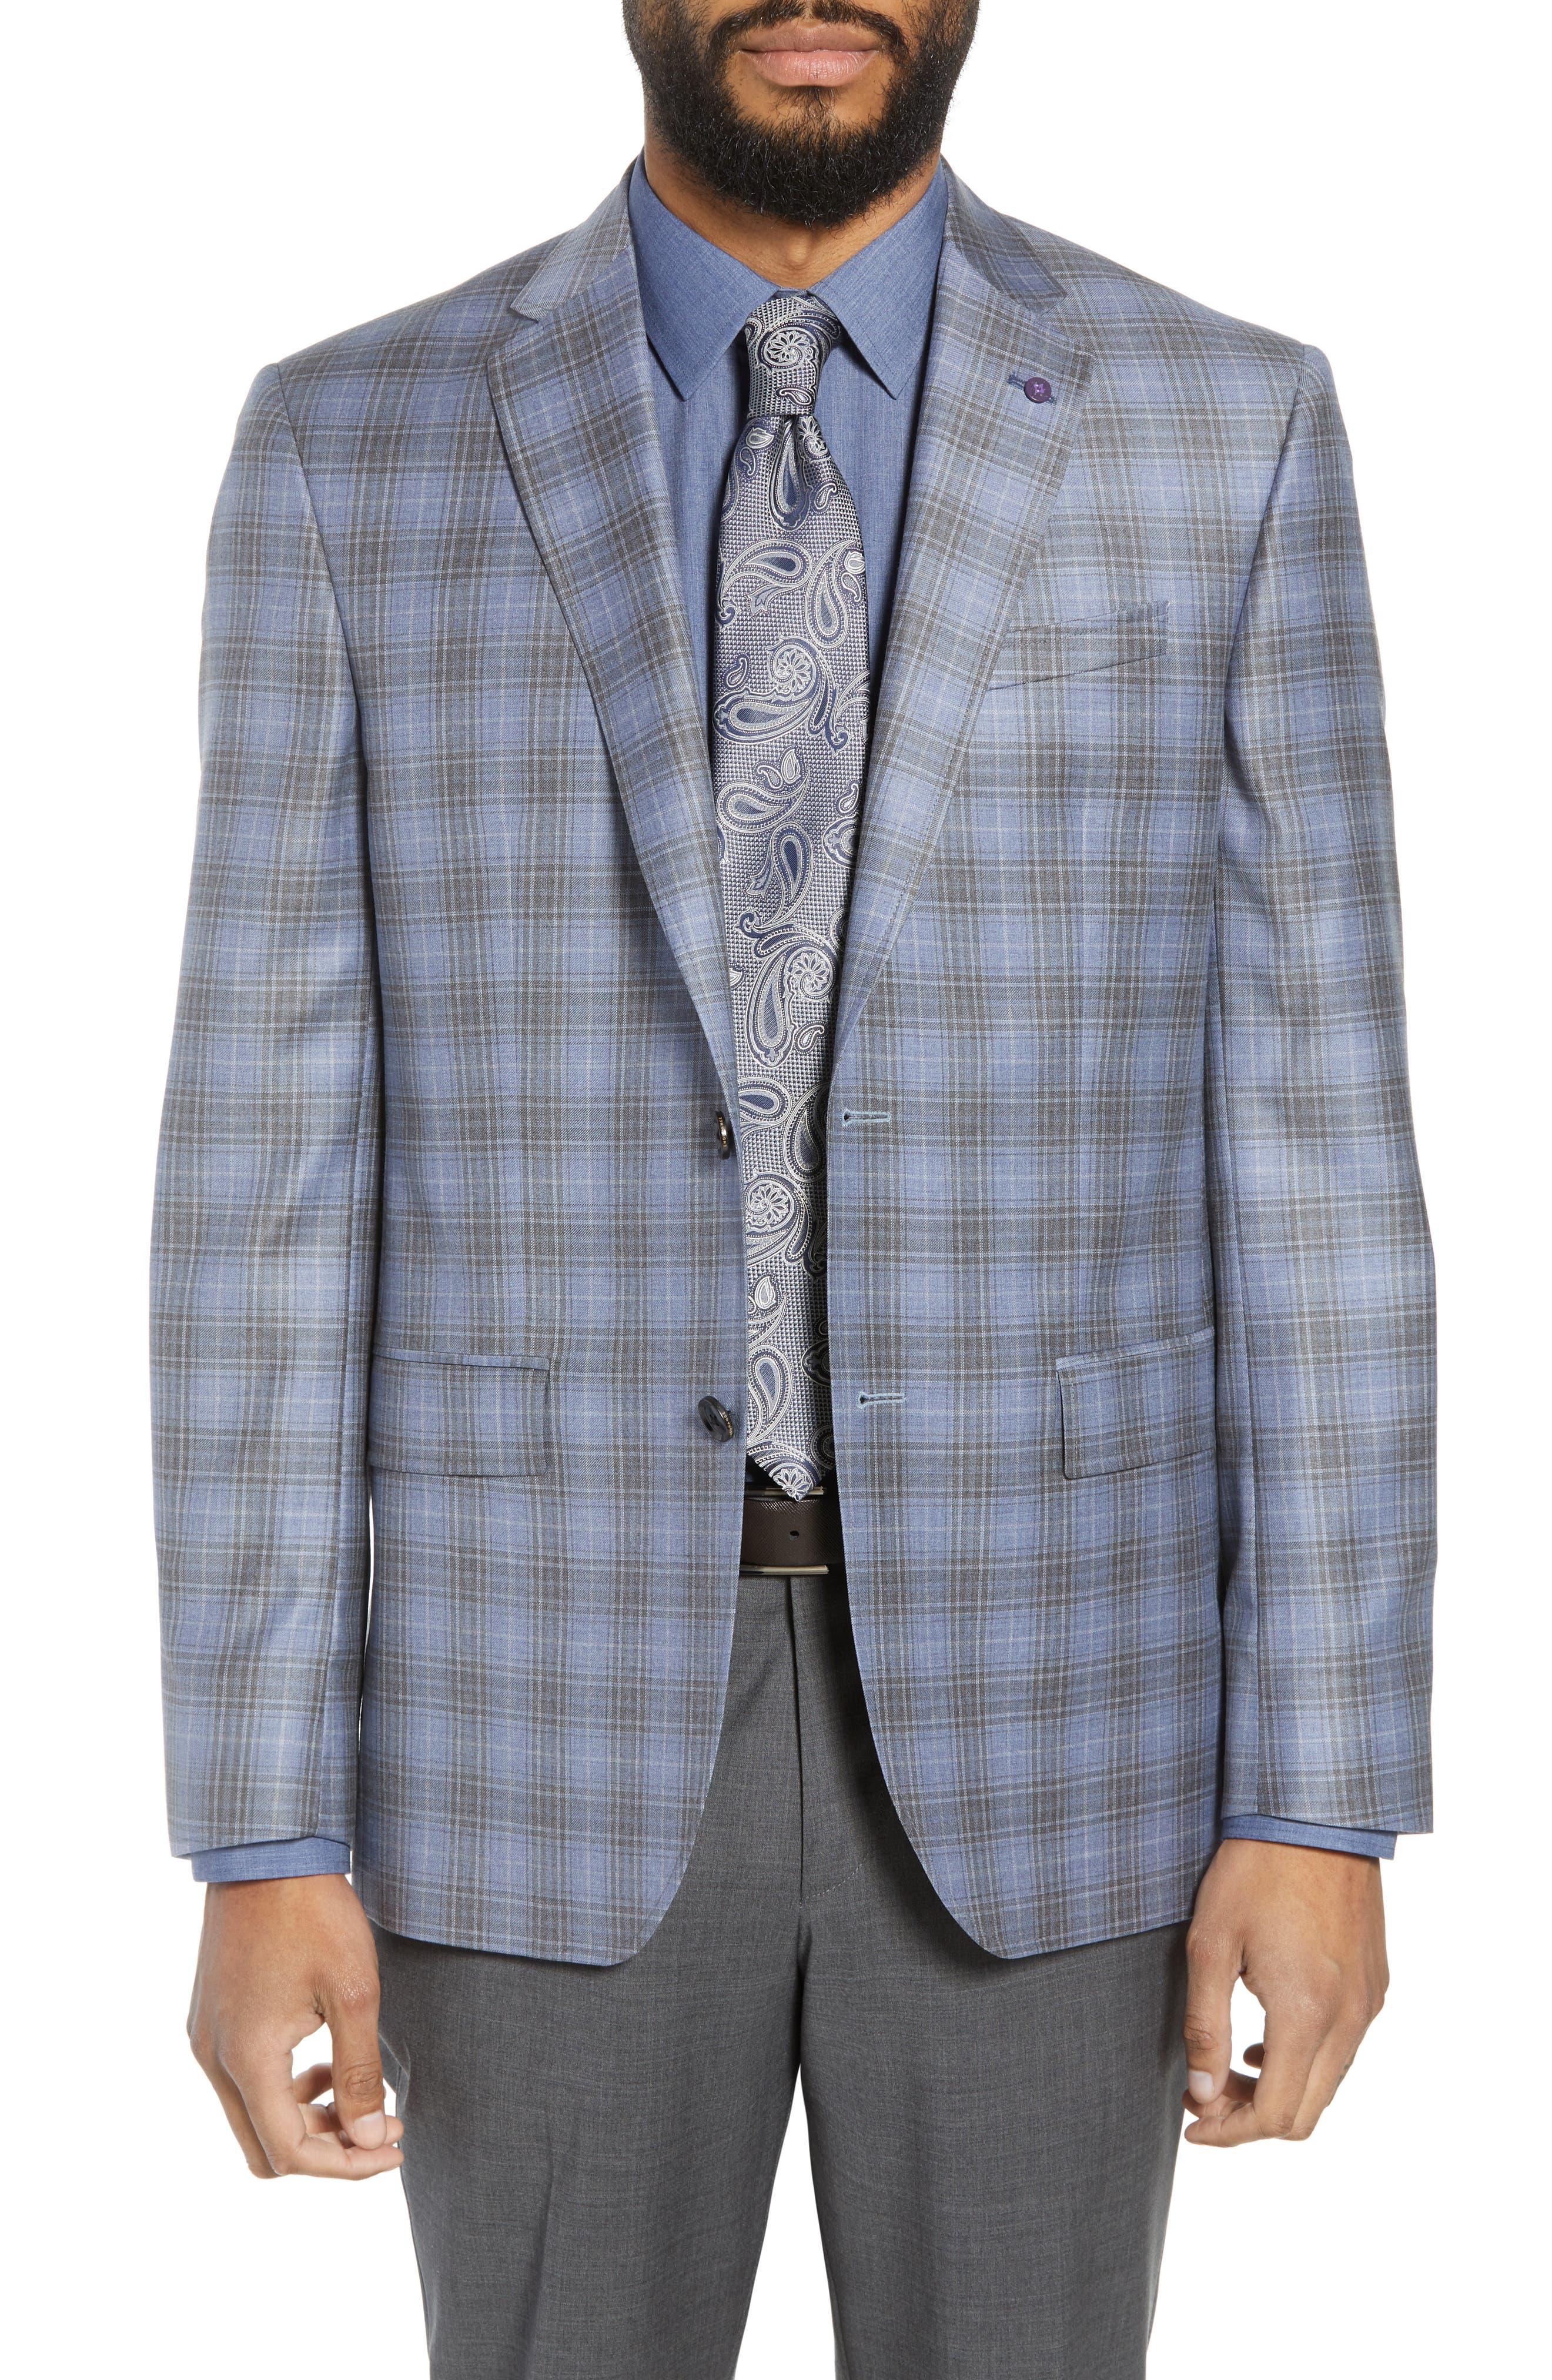 Jay Trim Fit Plaid Wool Sport Coat,                             Main thumbnail 1, color,                             400